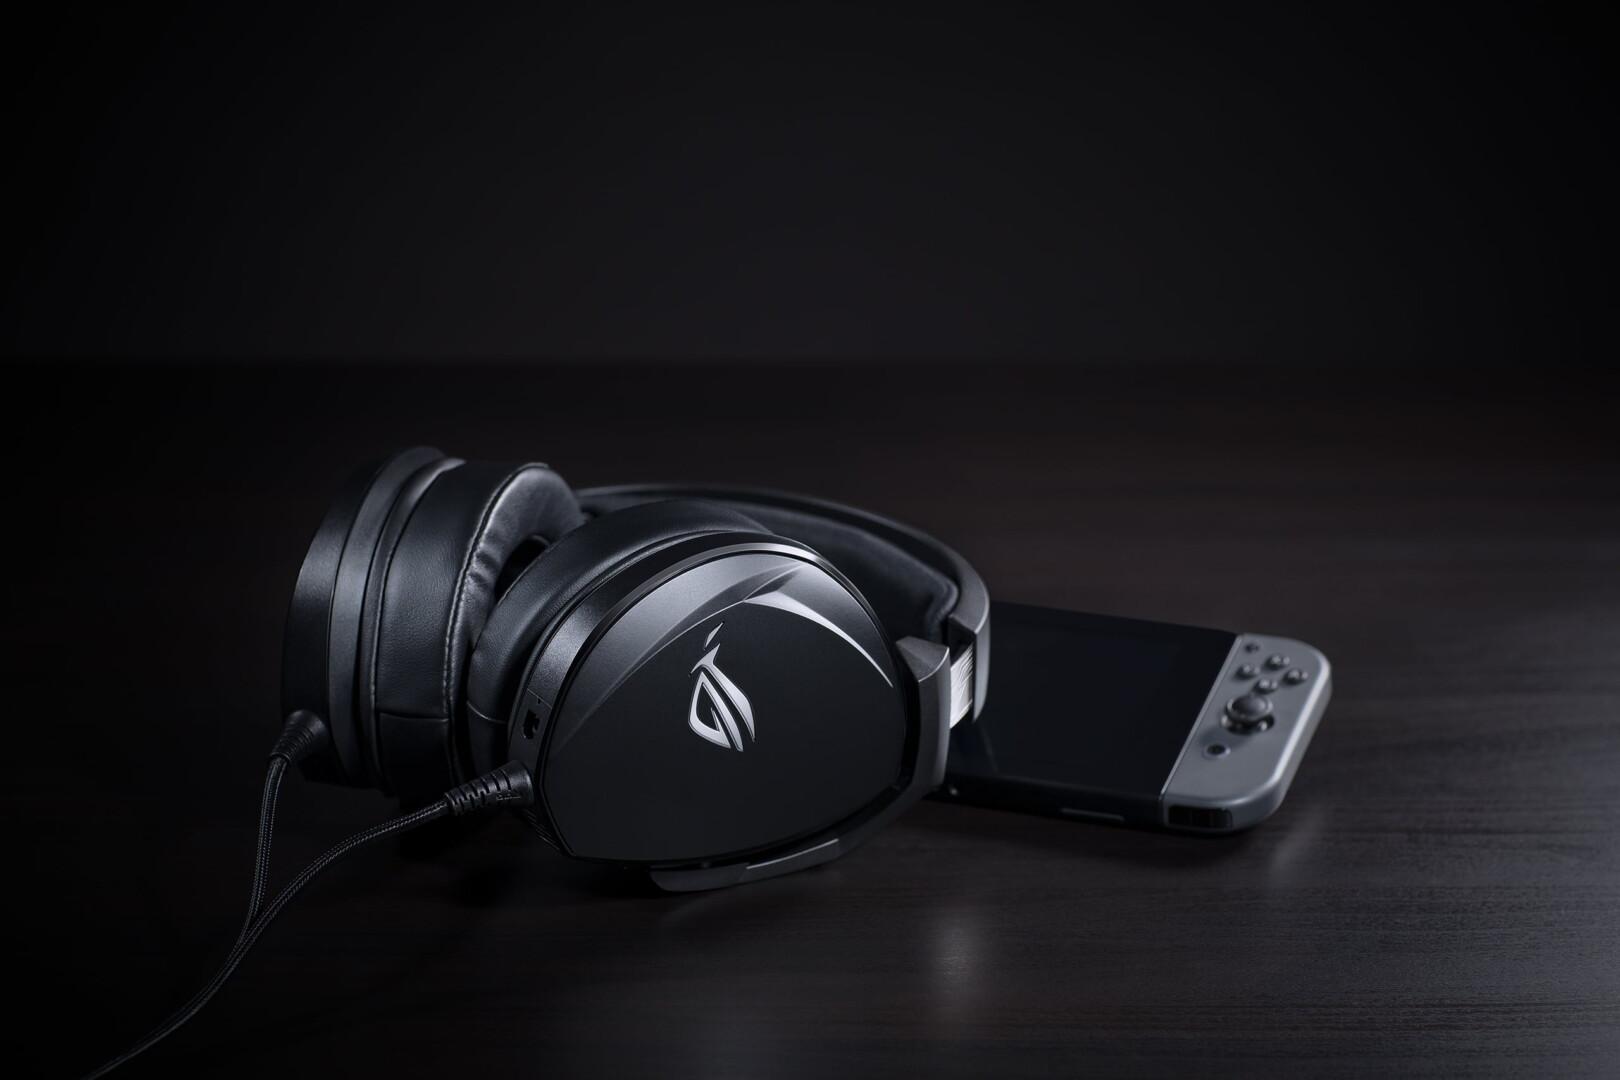 Rog Theta Electret: Presentate Le Cuffie Da Gaming Perfette Per Gli Audiofili 4 - Hynerd.it